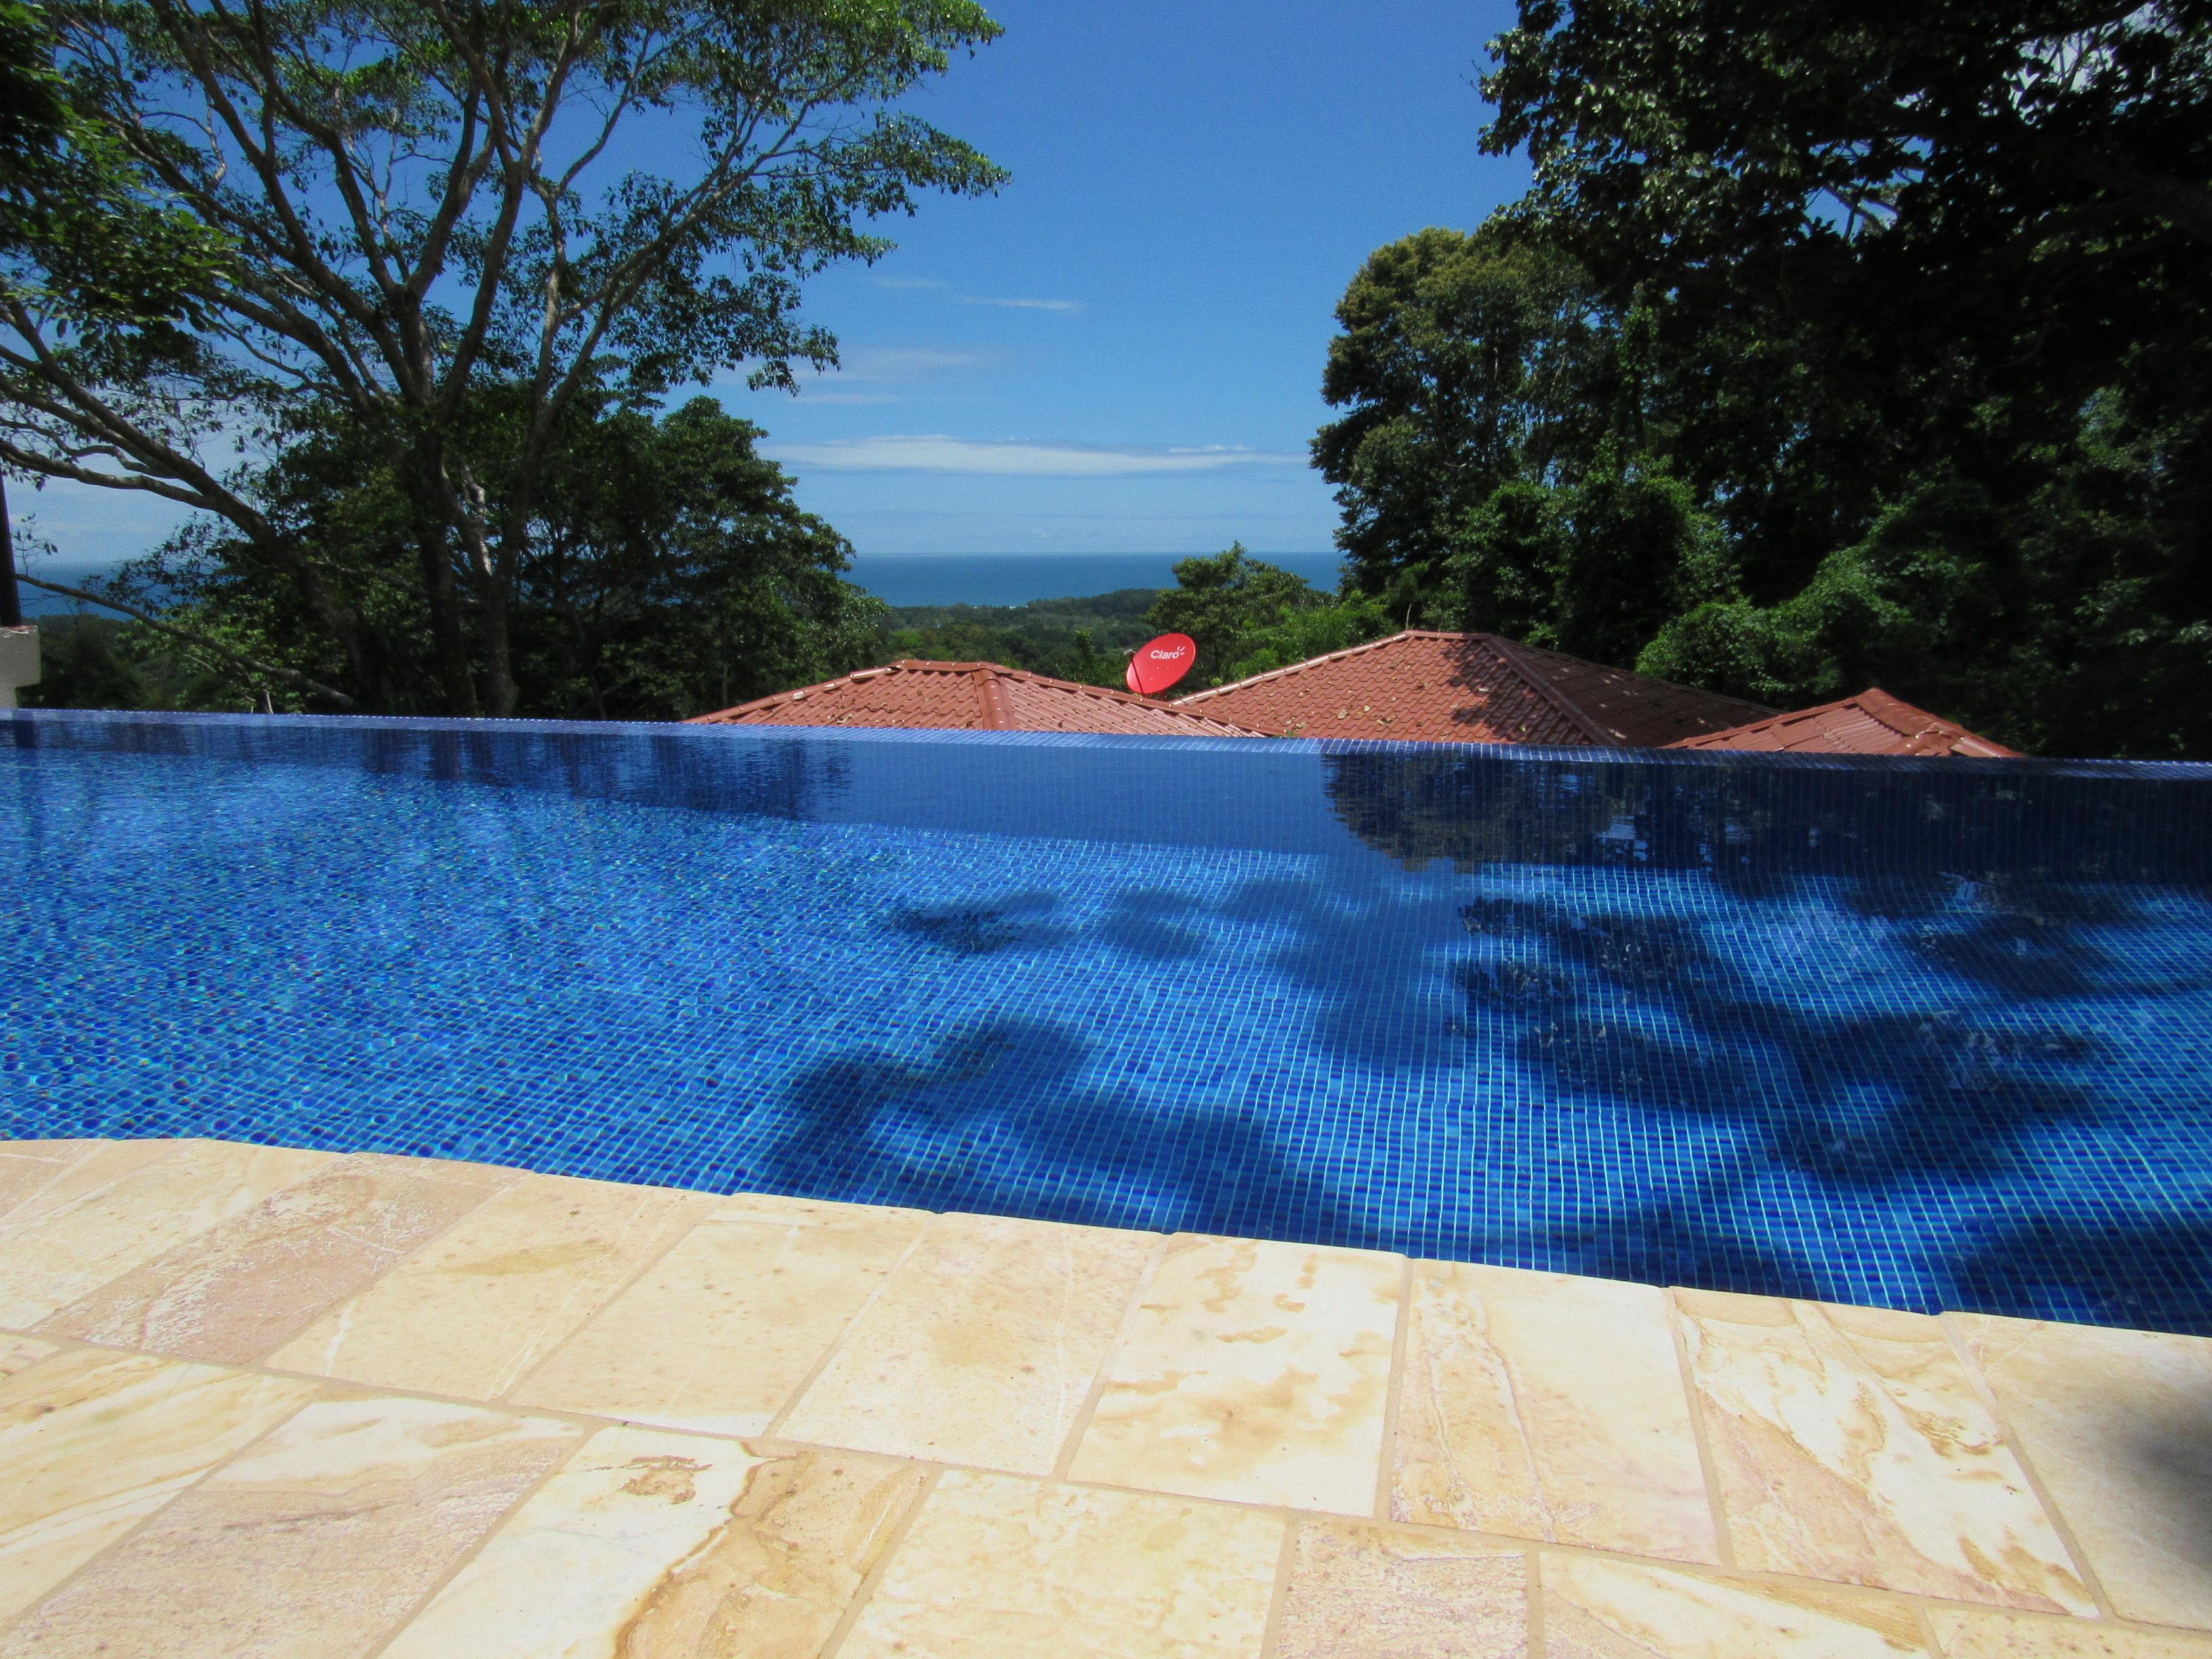 Hatillo-Costa-Rica-property-costaricarealestateHAT087-2.jpg